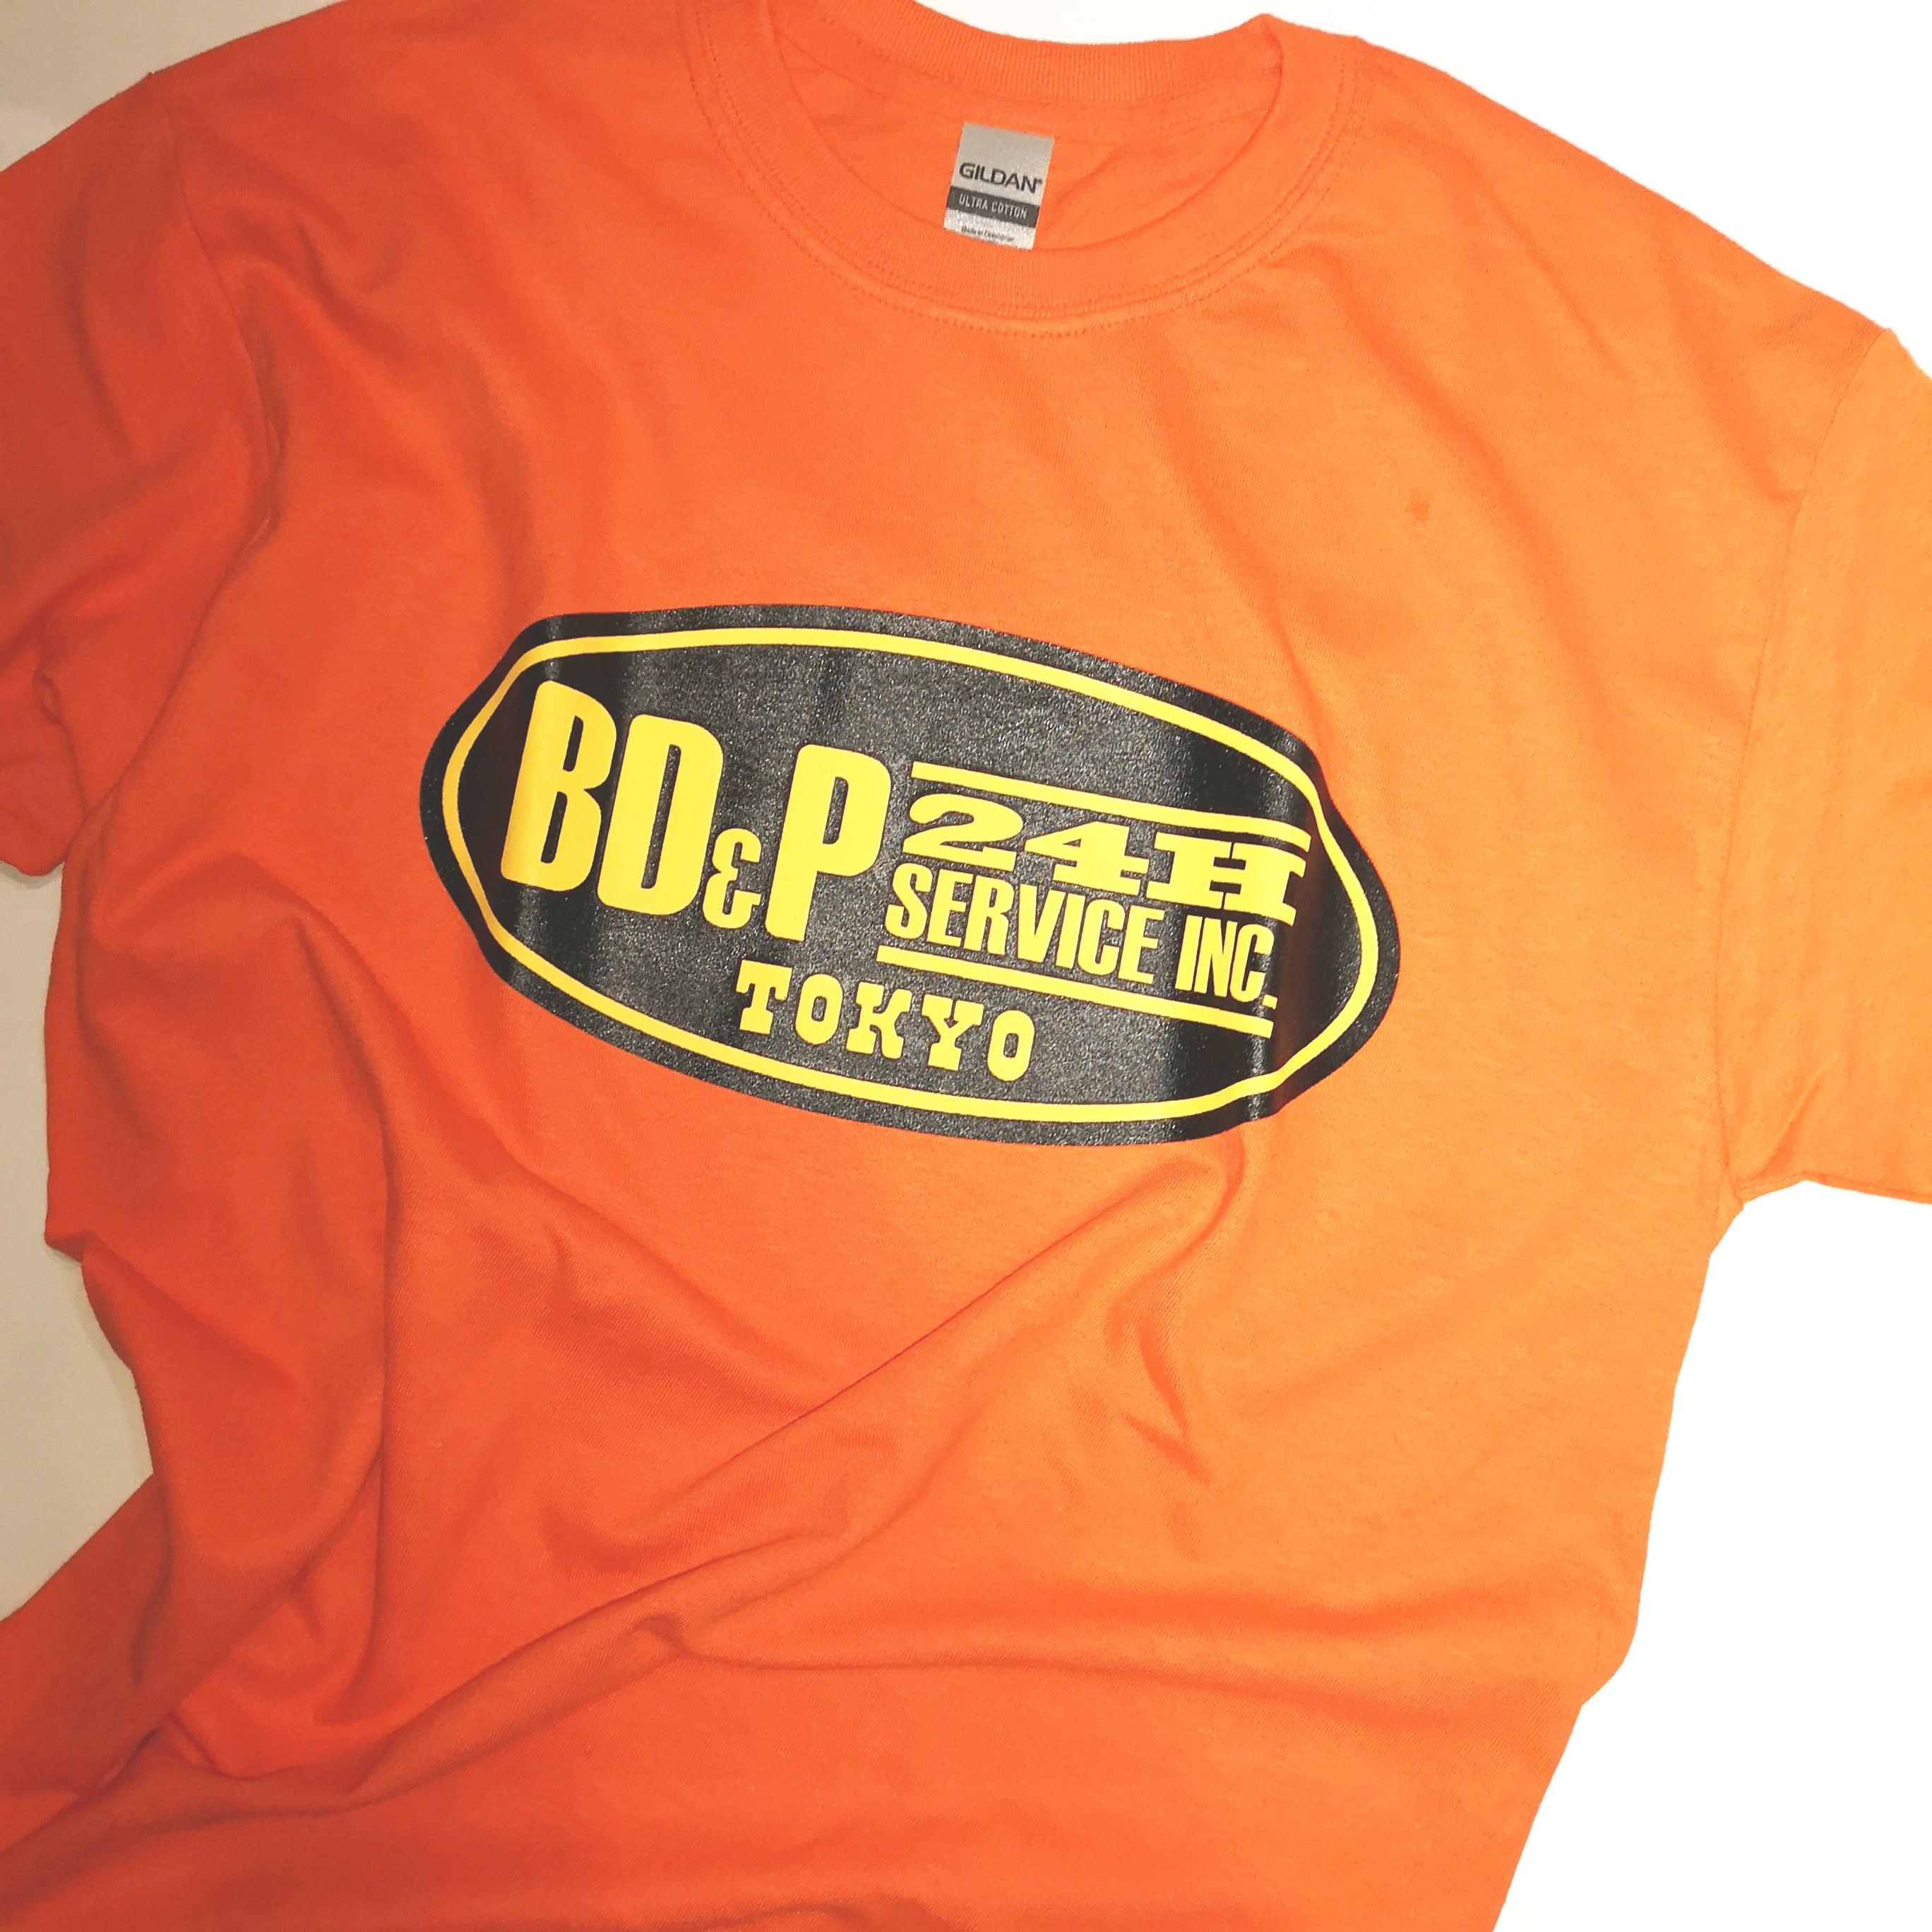 BD&P 24H SERVICE INC. STAFF TEE